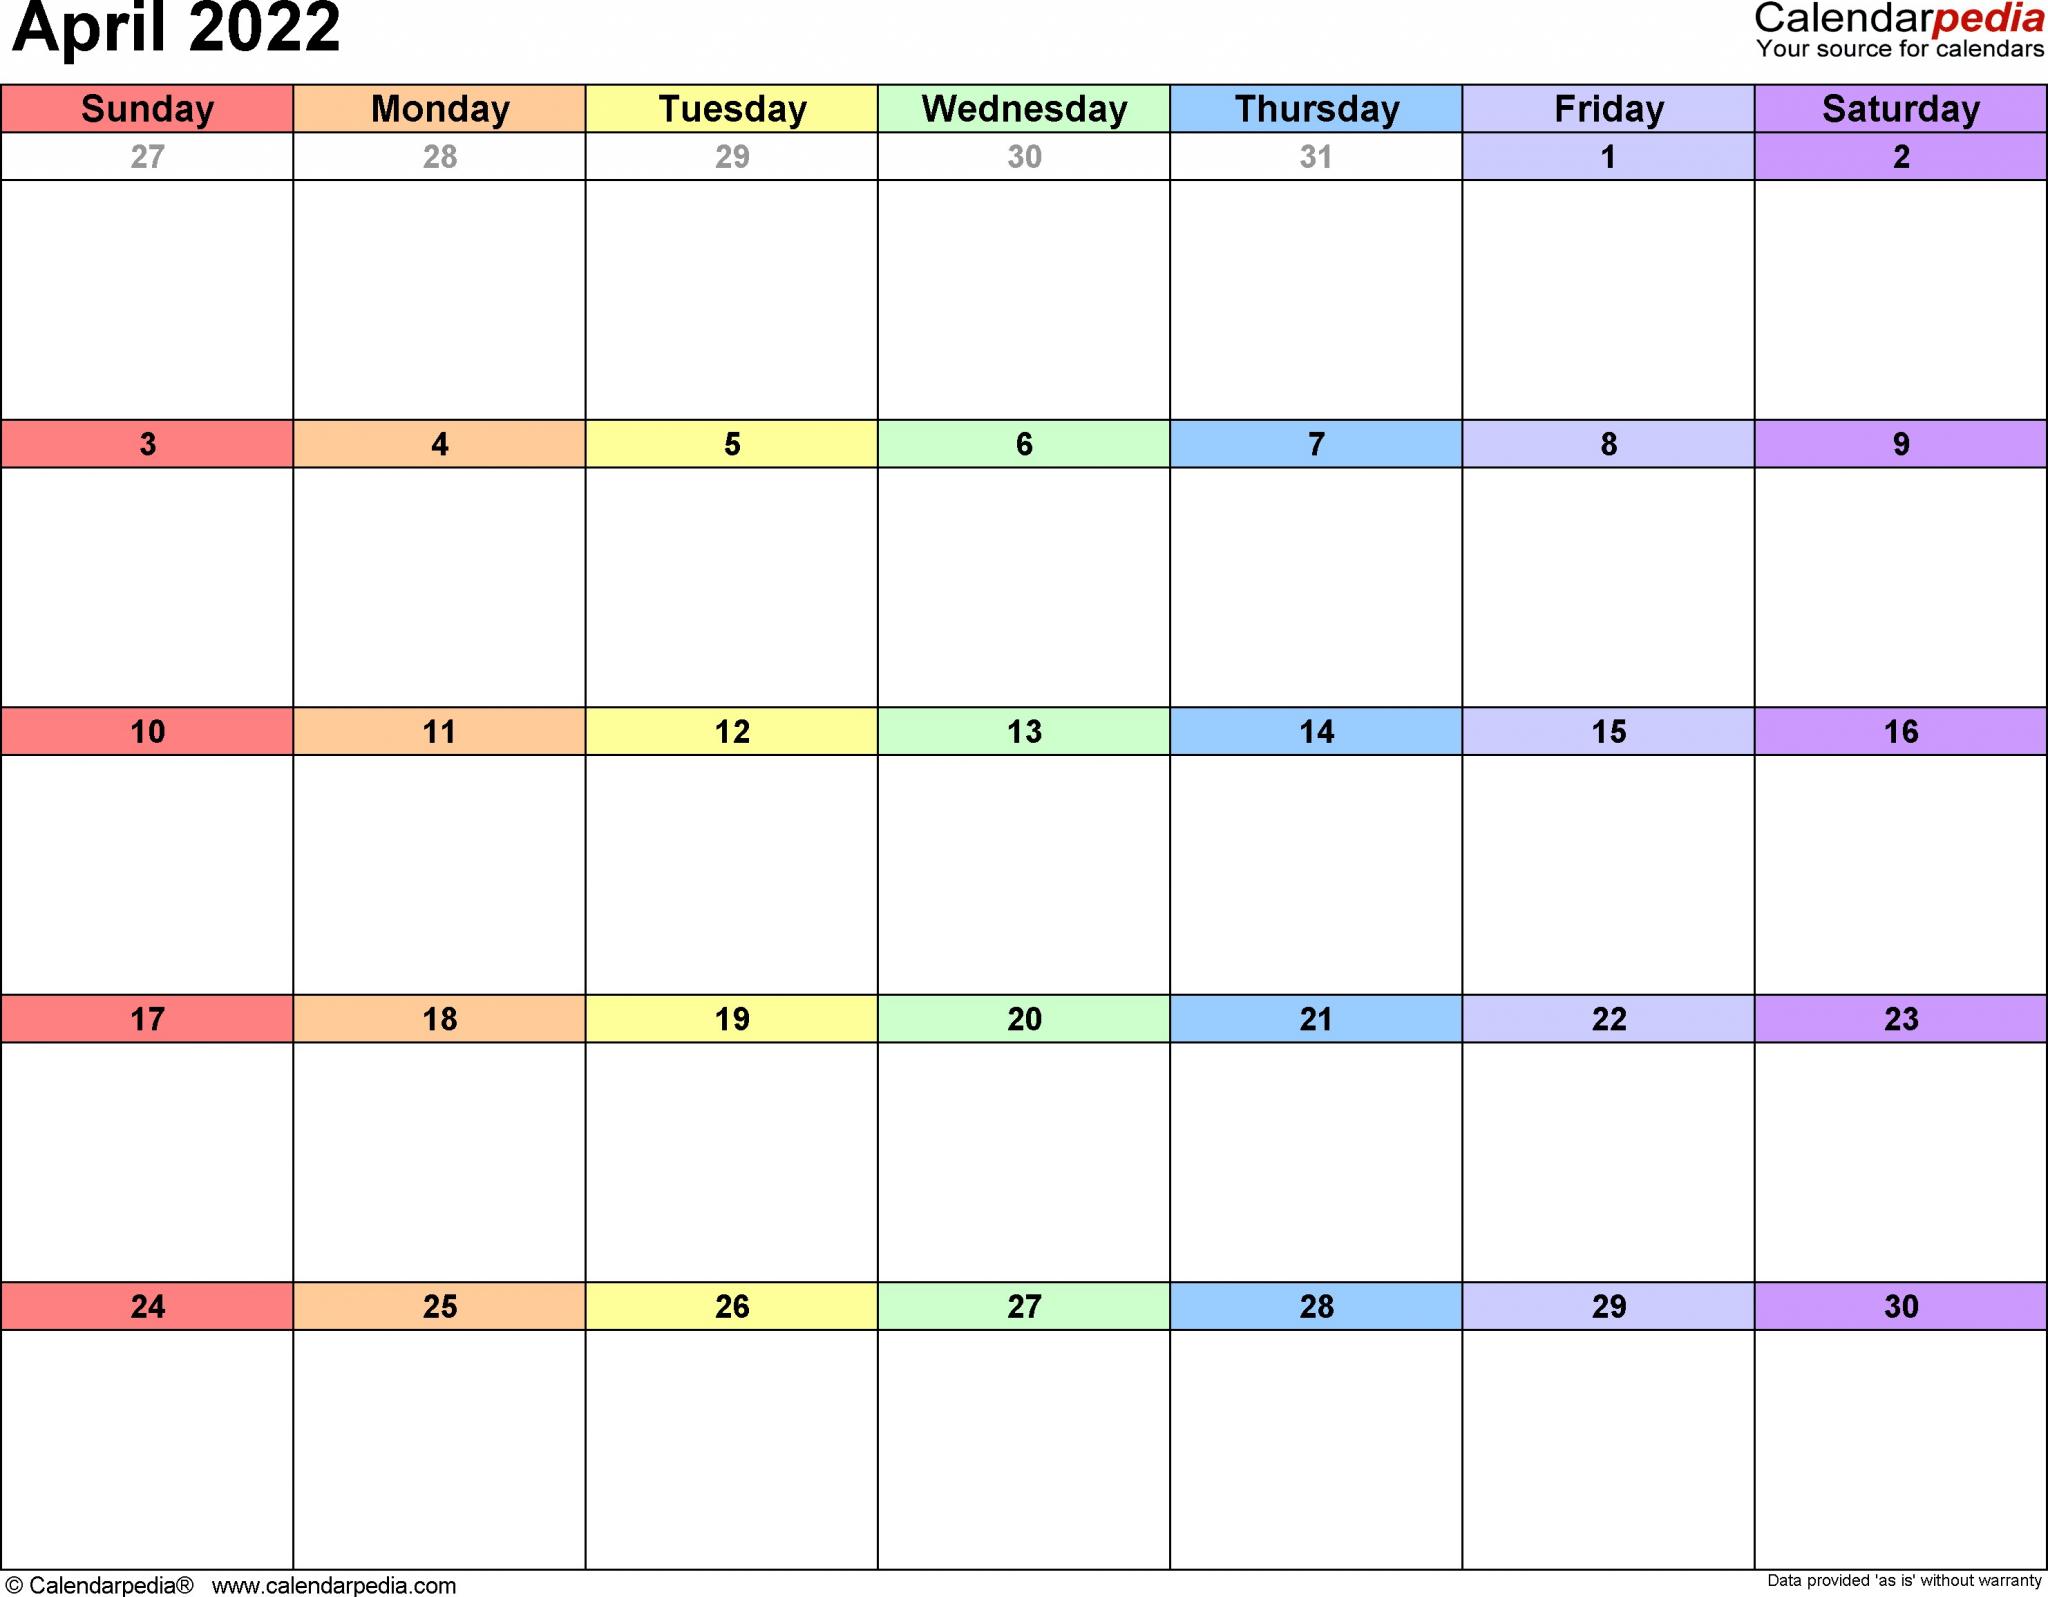 April 2022 Calendar Printable   Free Printable Calendar throughout April Monthly Calendar 2022 Free Printable Photo